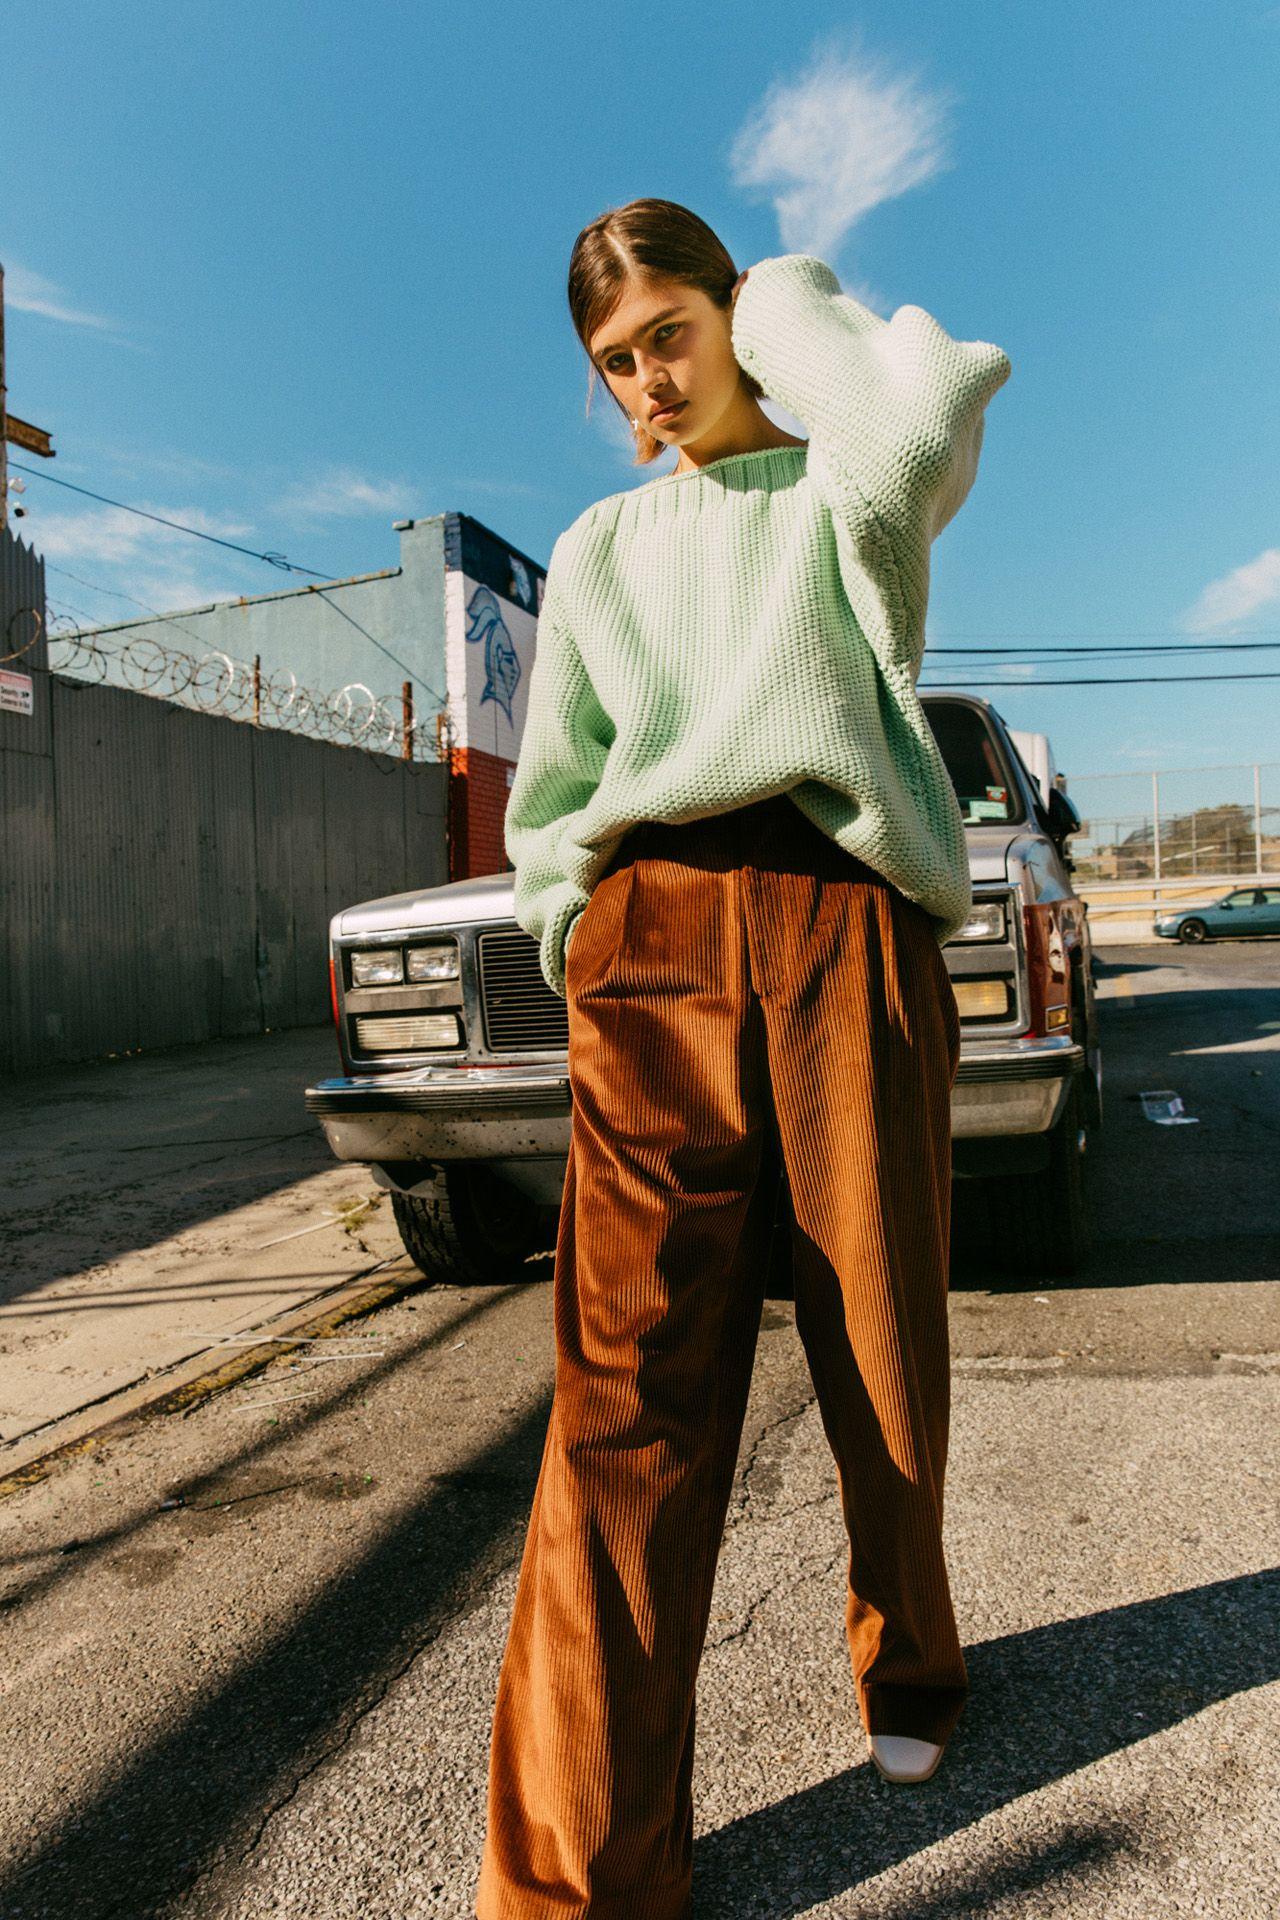 Zak photographed by Kelly Jacob